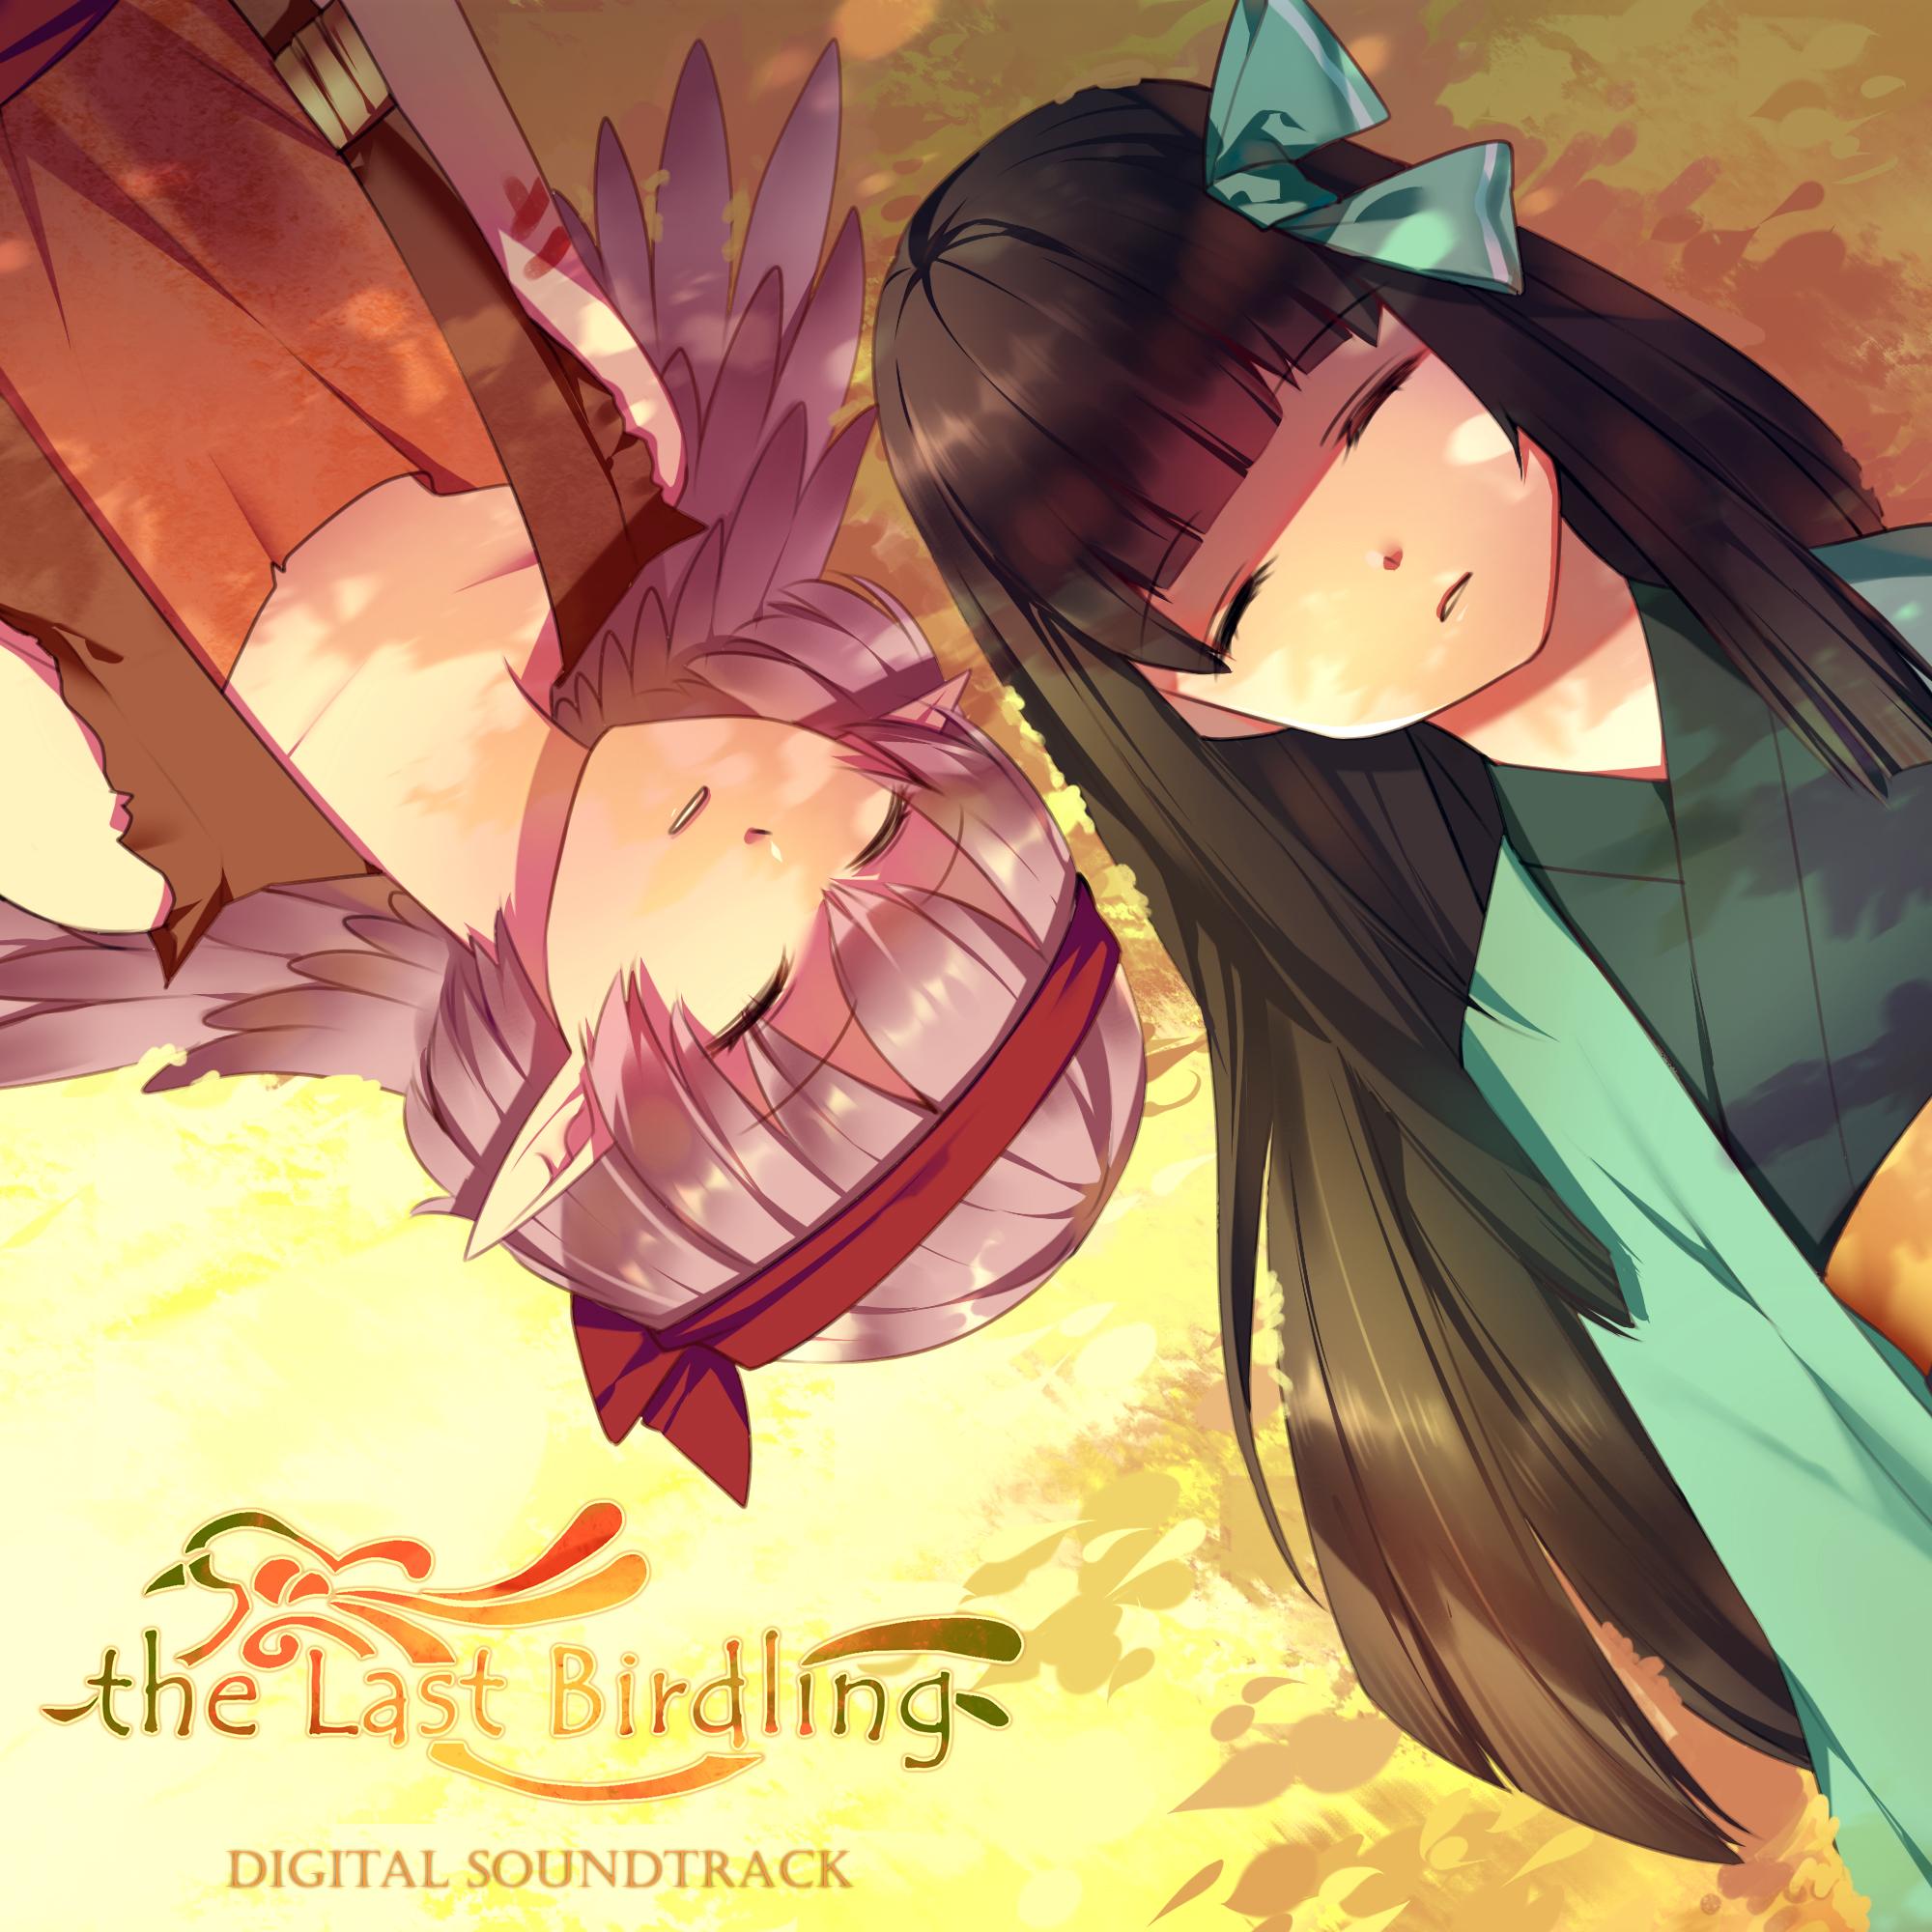 The Last Birdling - Digital soundtrack screenshot